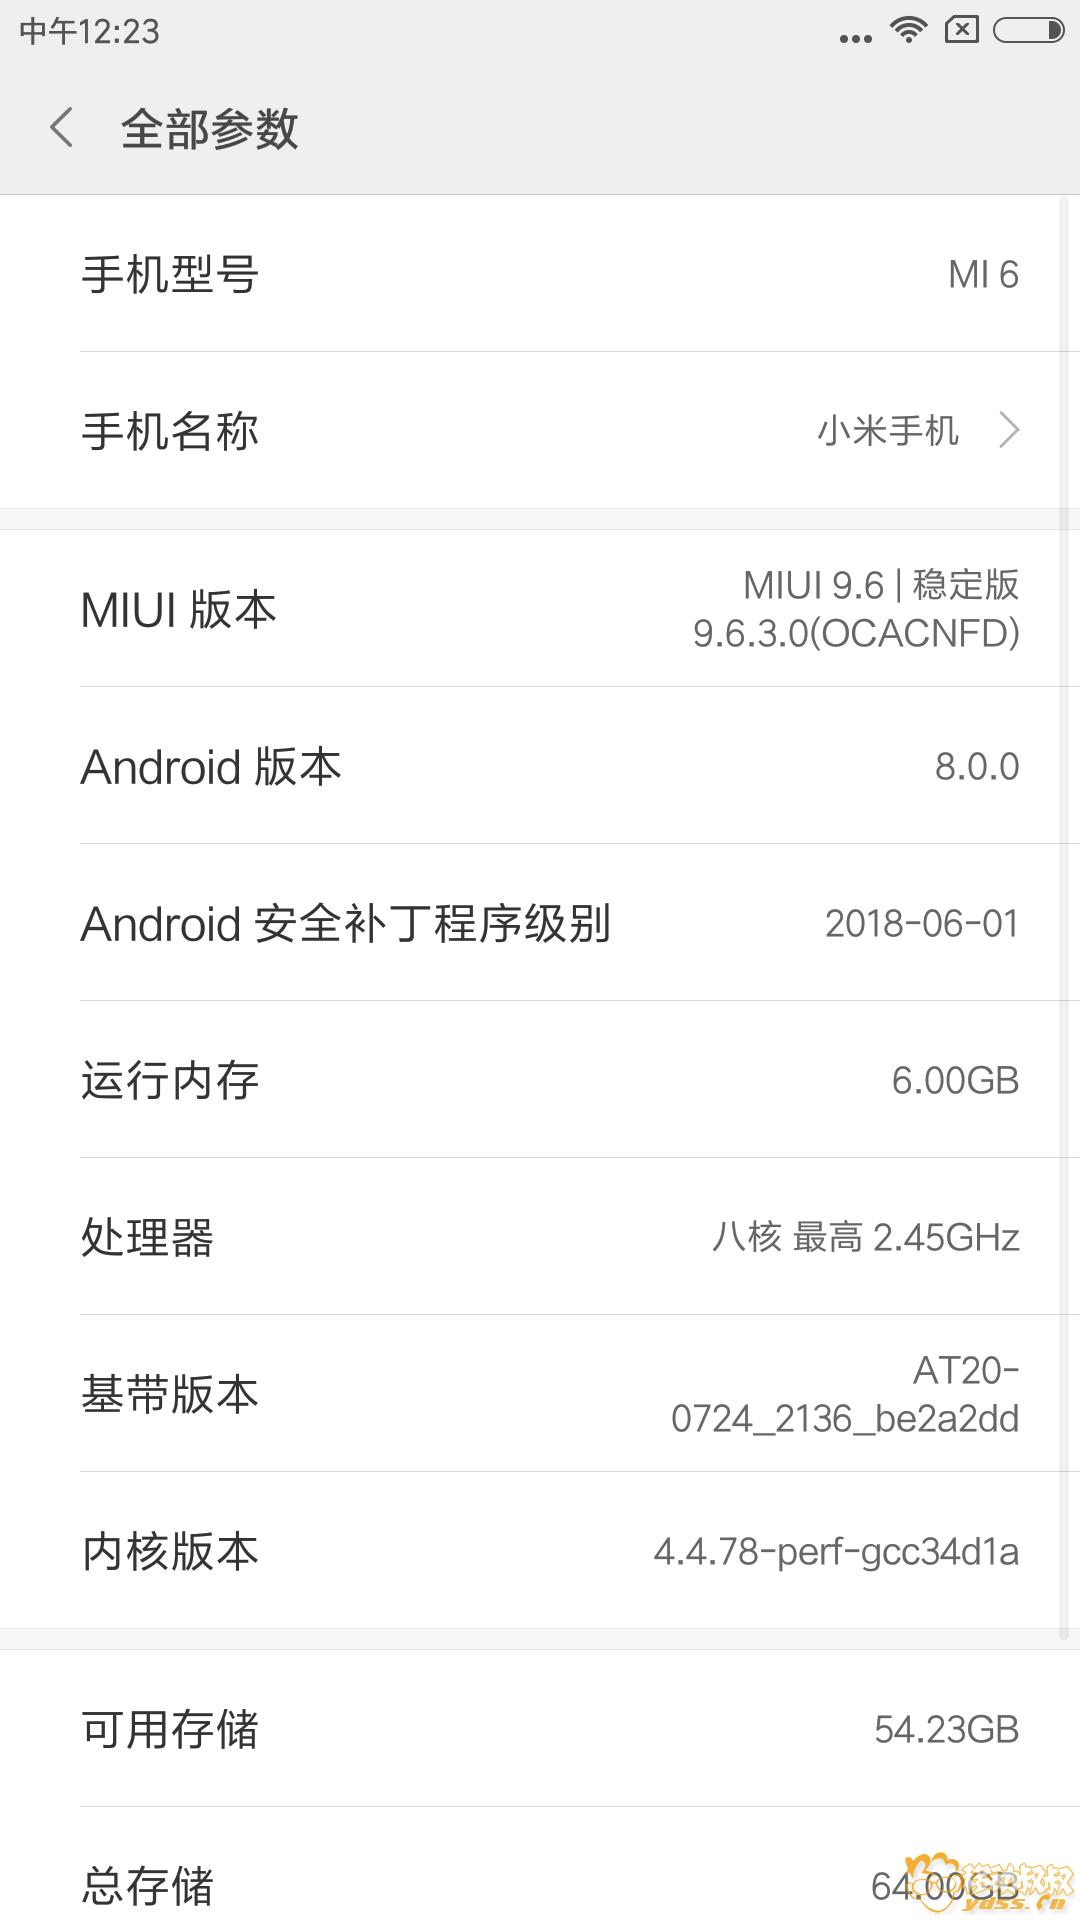 Screenshot_2018-08-23-12-23-27-607_com.android.settings.png